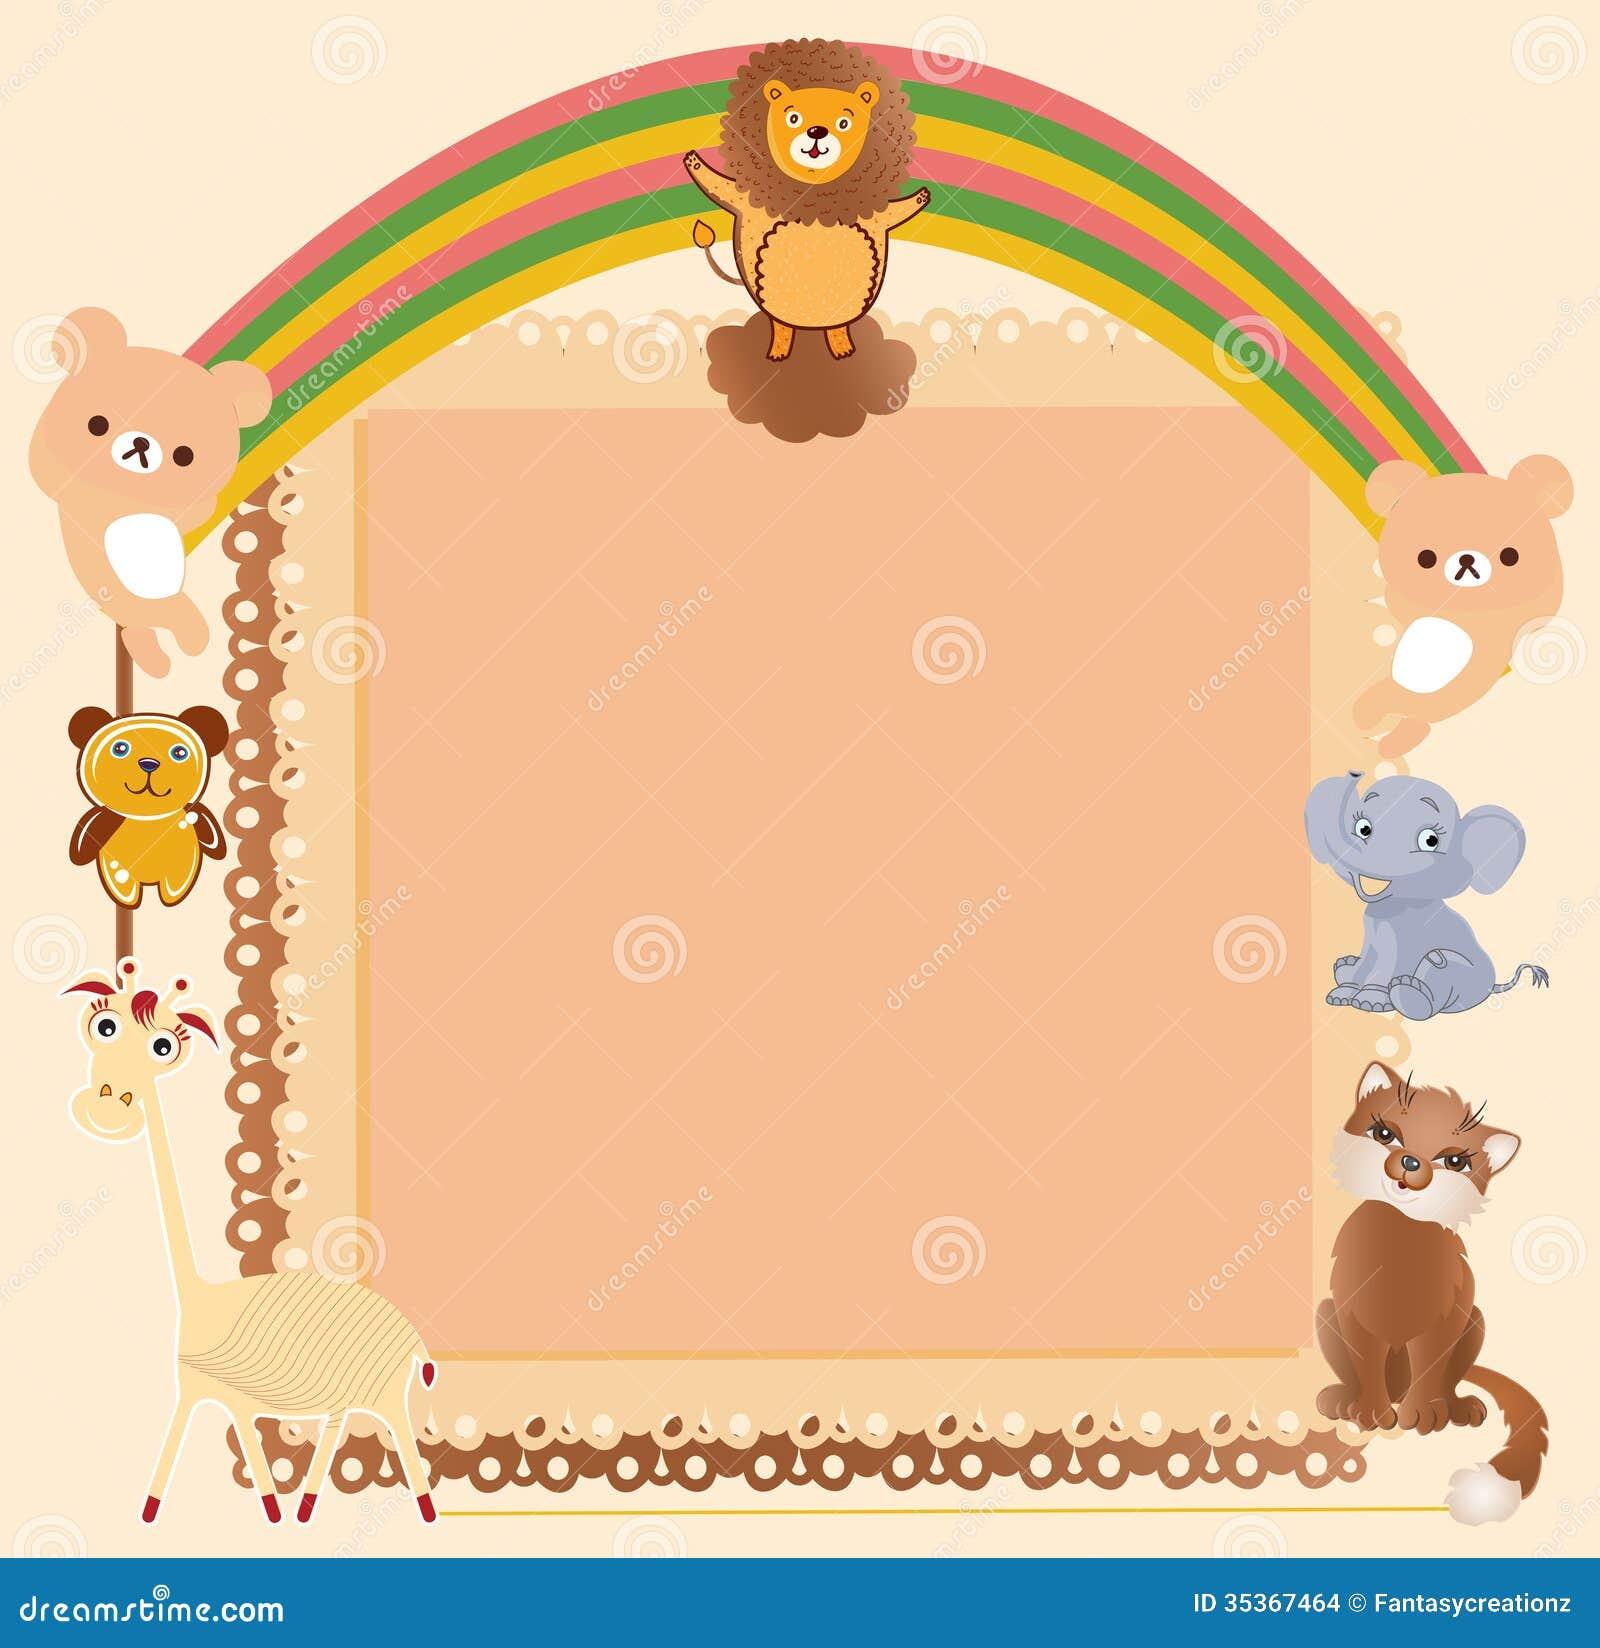 Similiar Cute Animal Borders Keywords